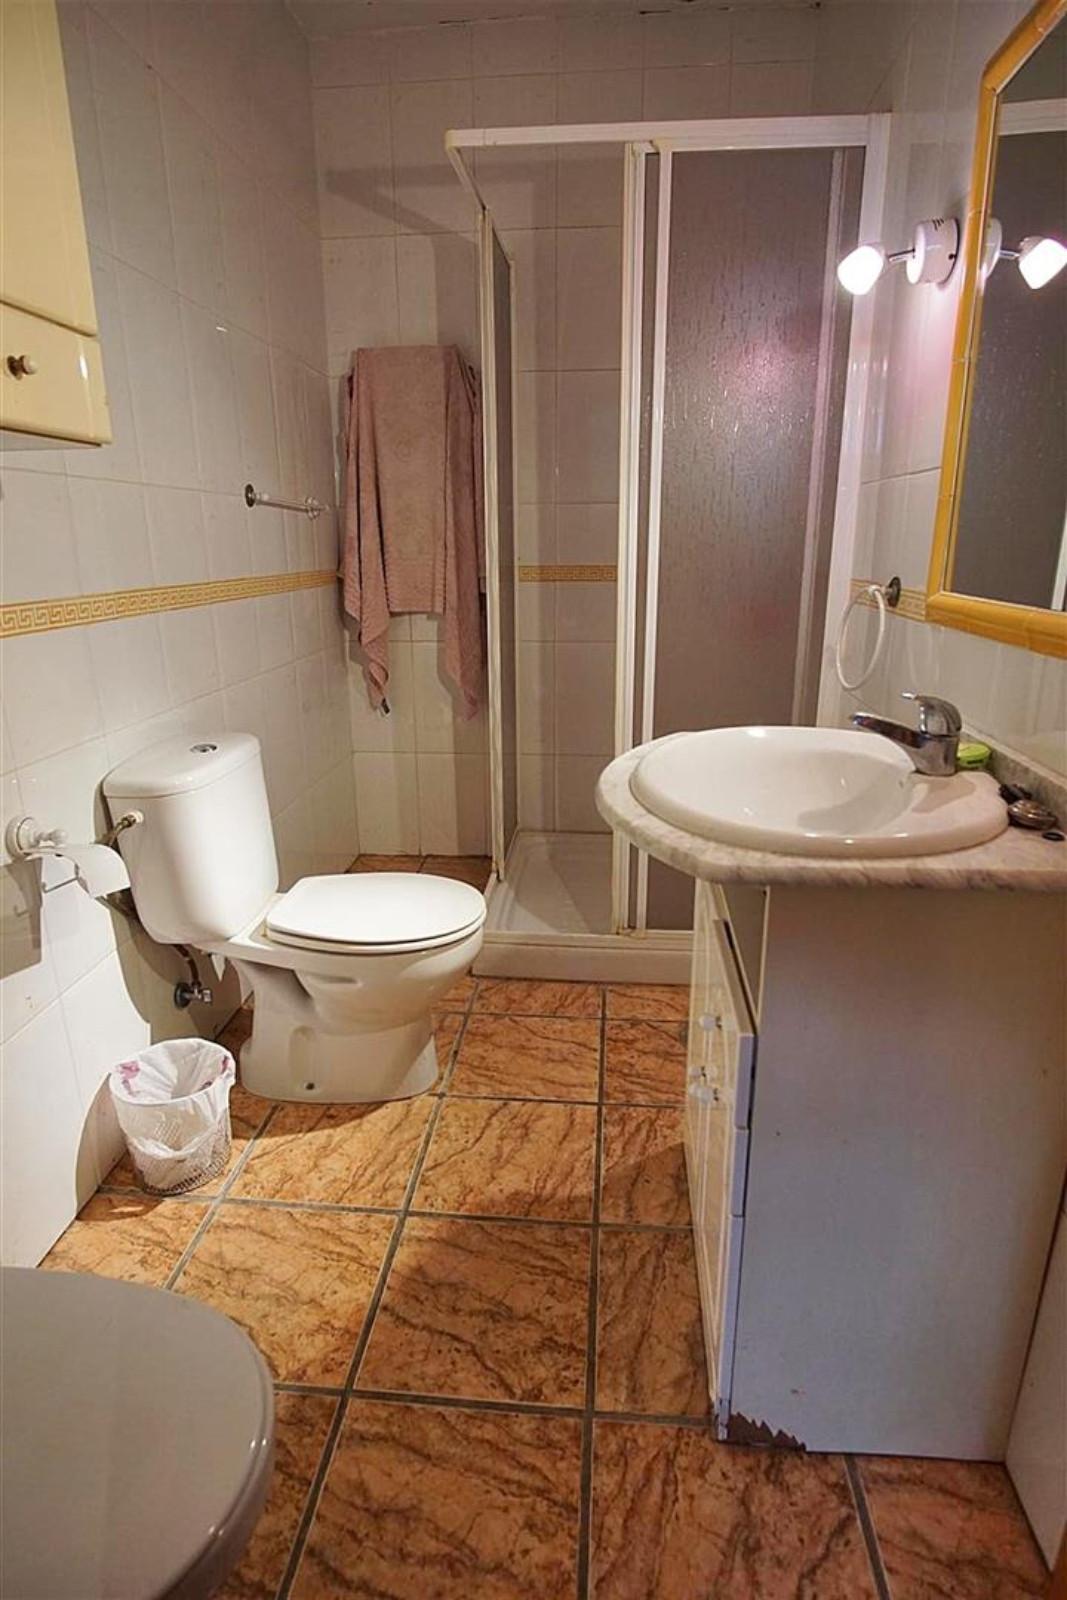 Photo of property R3556111, 37 de 40